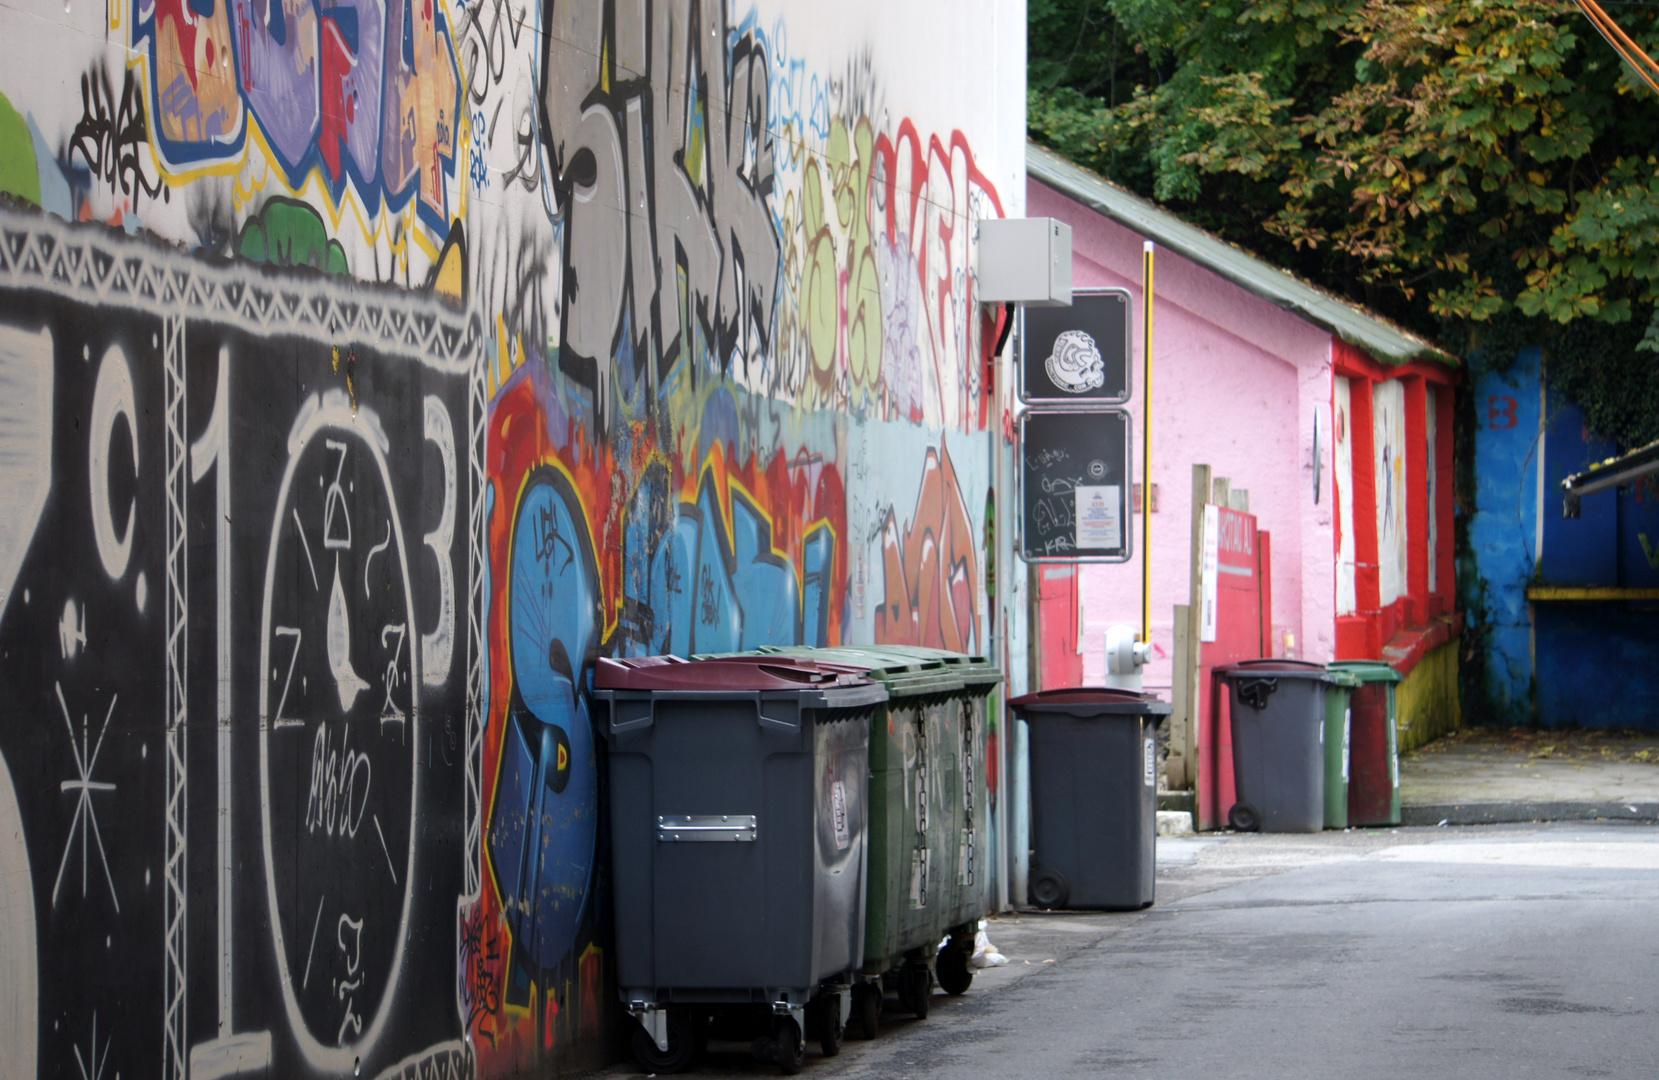 Lausanne, Schweiz, Lausanne-Flon, Hinterhausansicht, Müllcontainer, Mülleimer